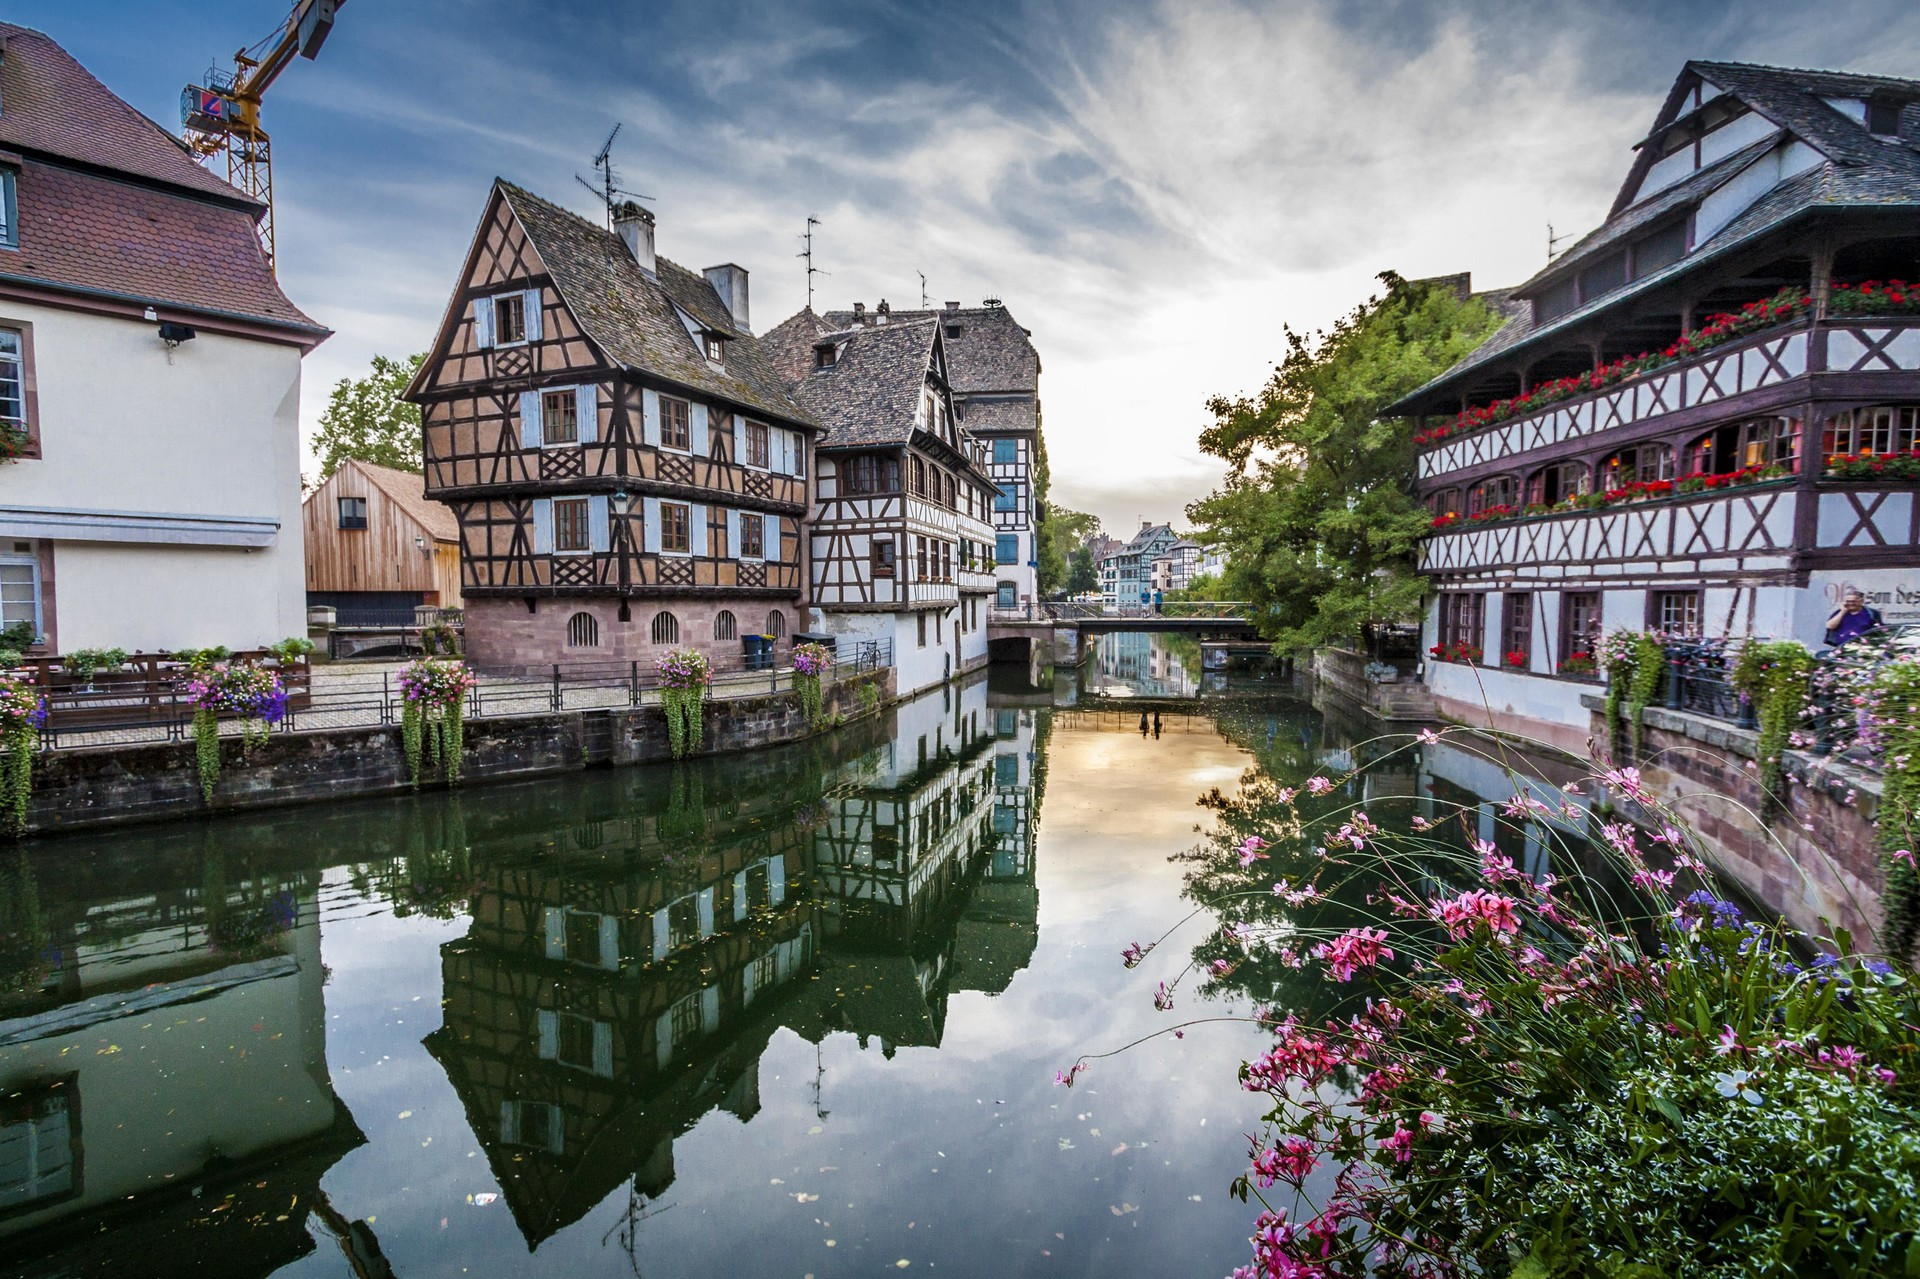 L'esperienza Erasmus a Strasburgo (Francia) di Linzi